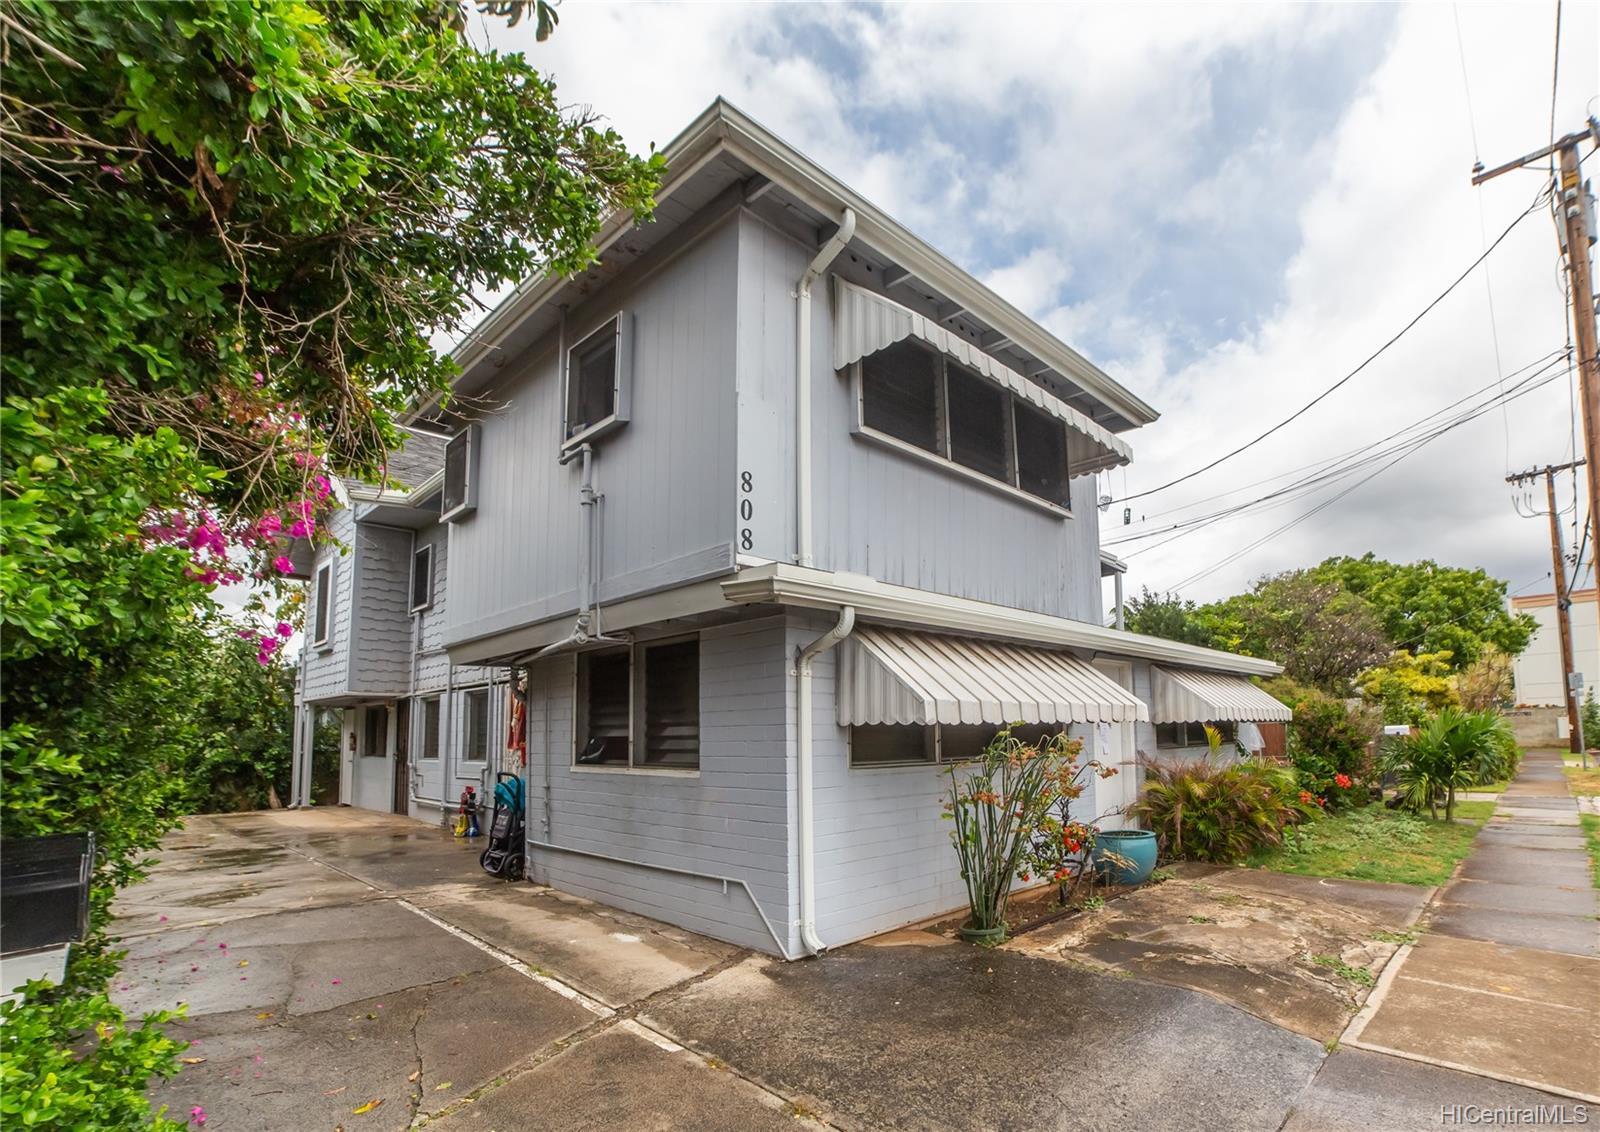 808 Makaleka Ave Honolulu - Multi-family - photo 4 of 18